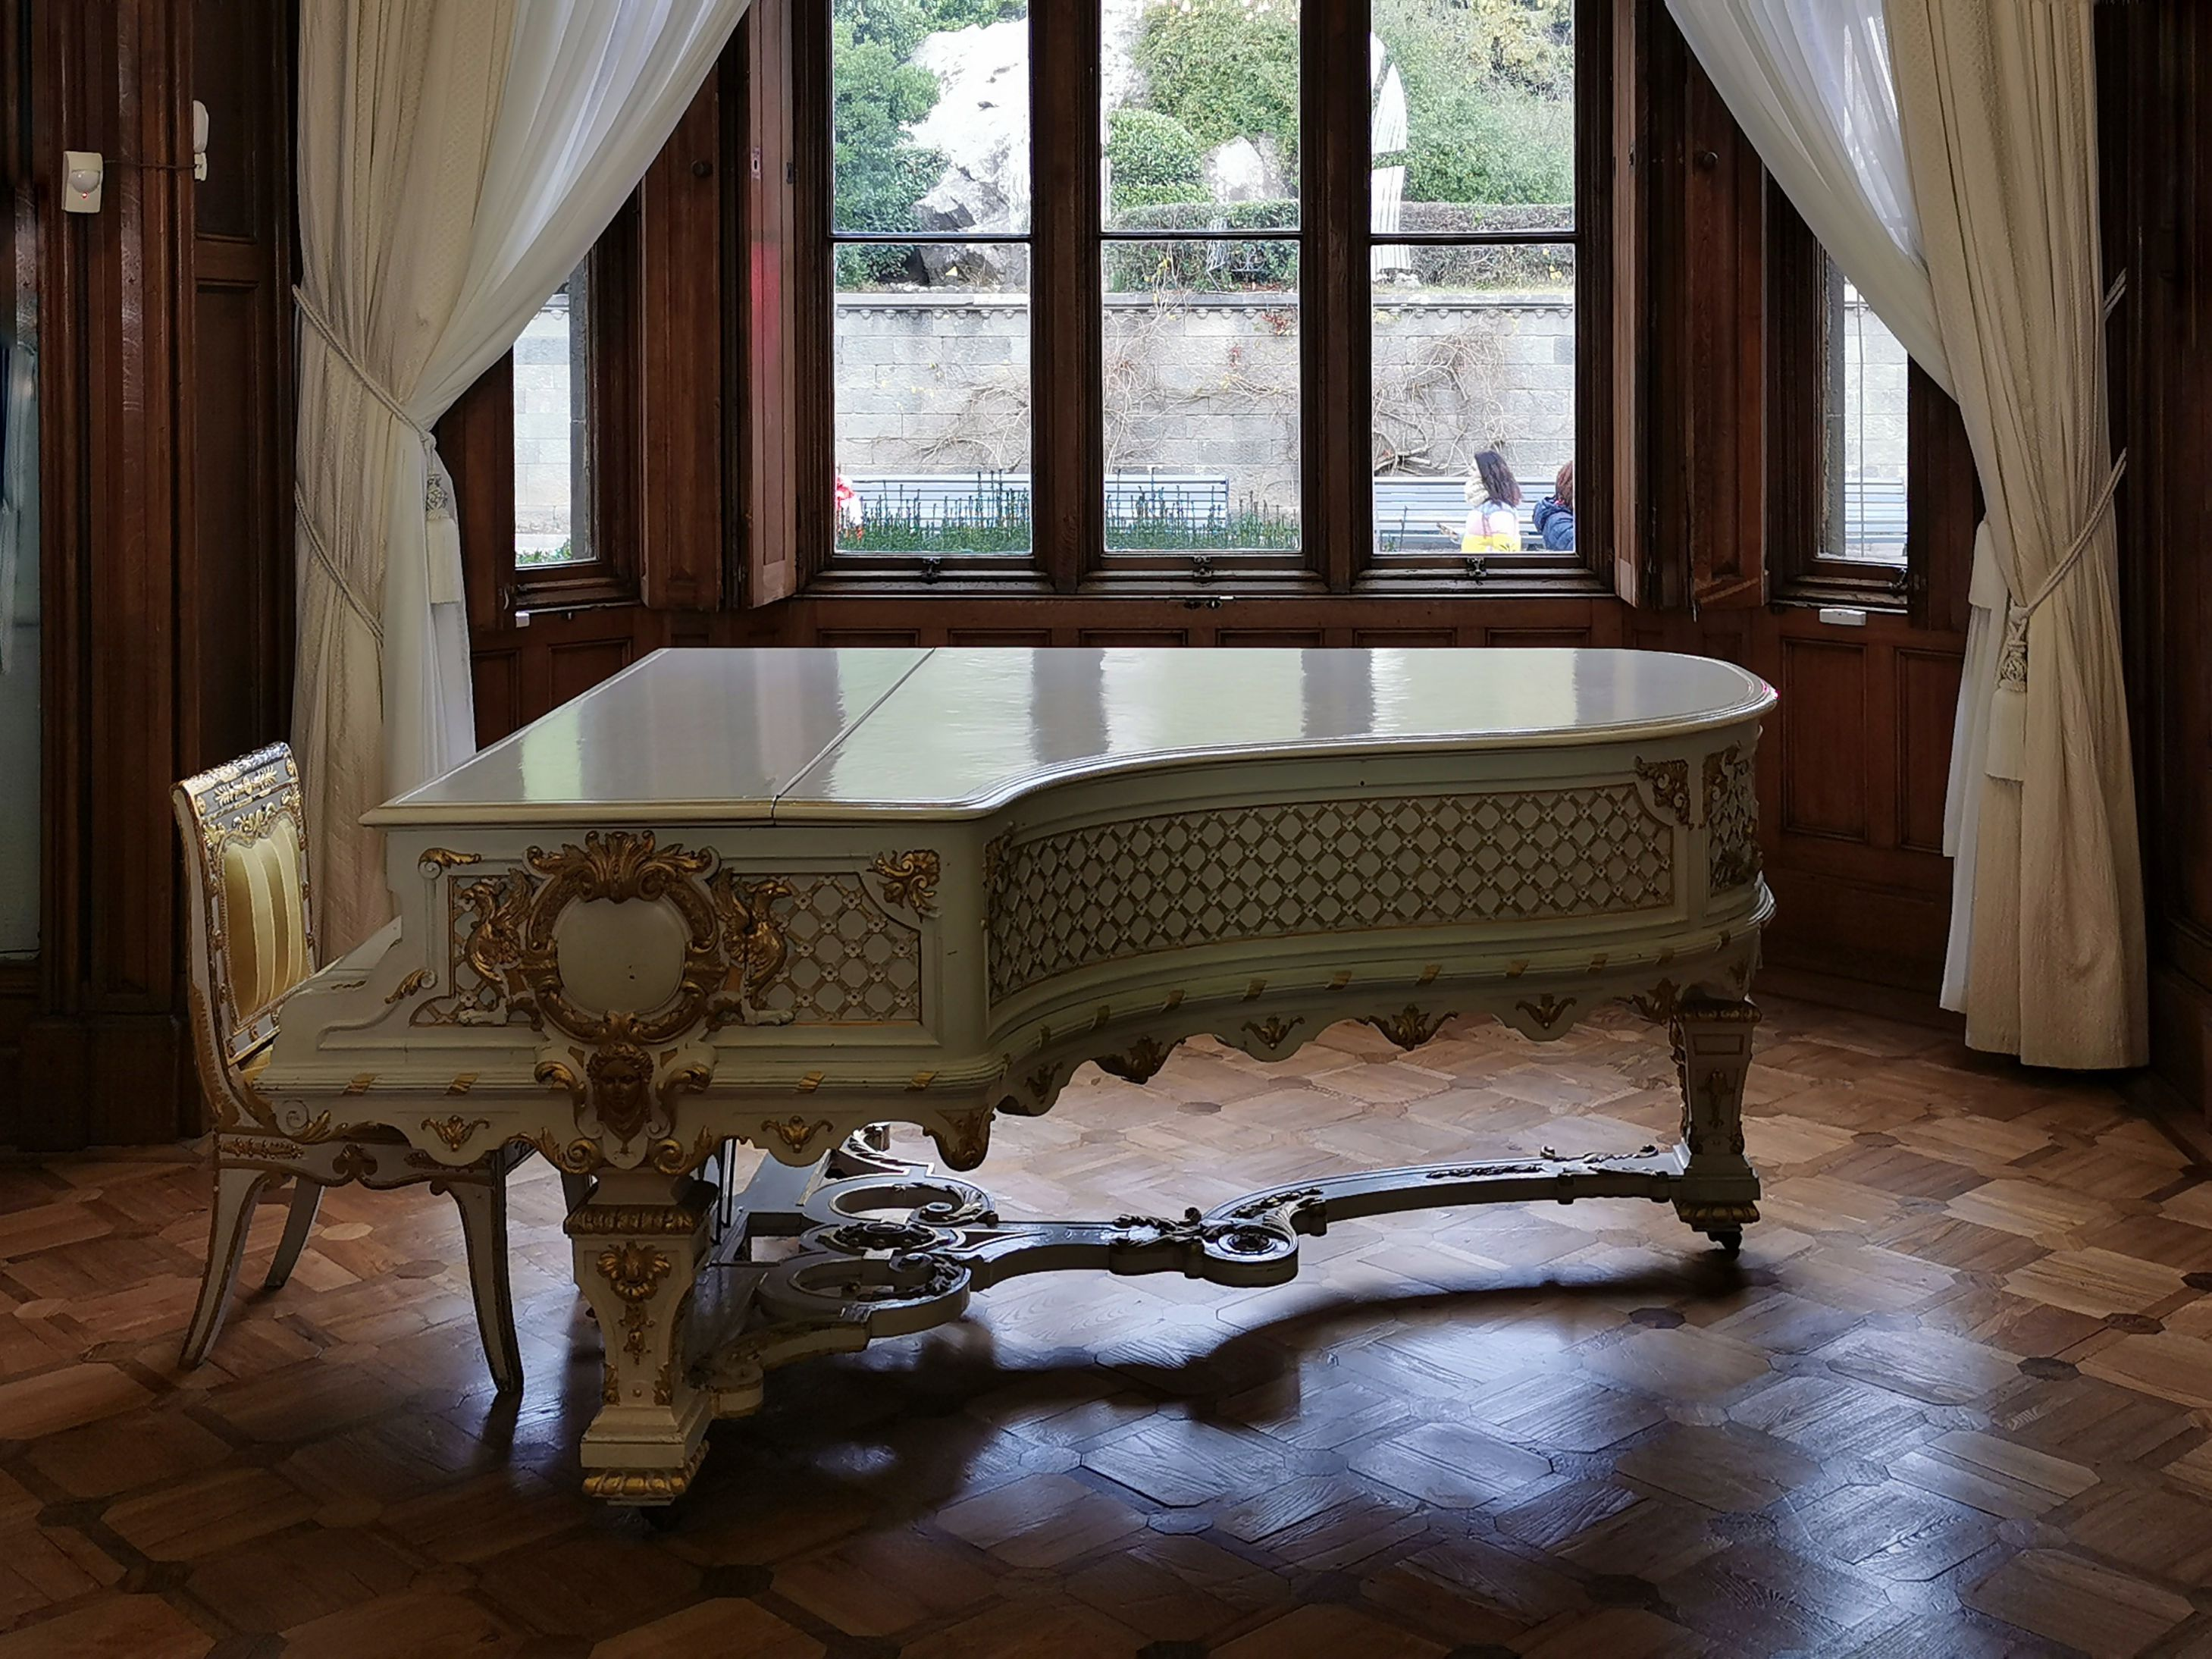 muzej-vorontsovkij-dvorez